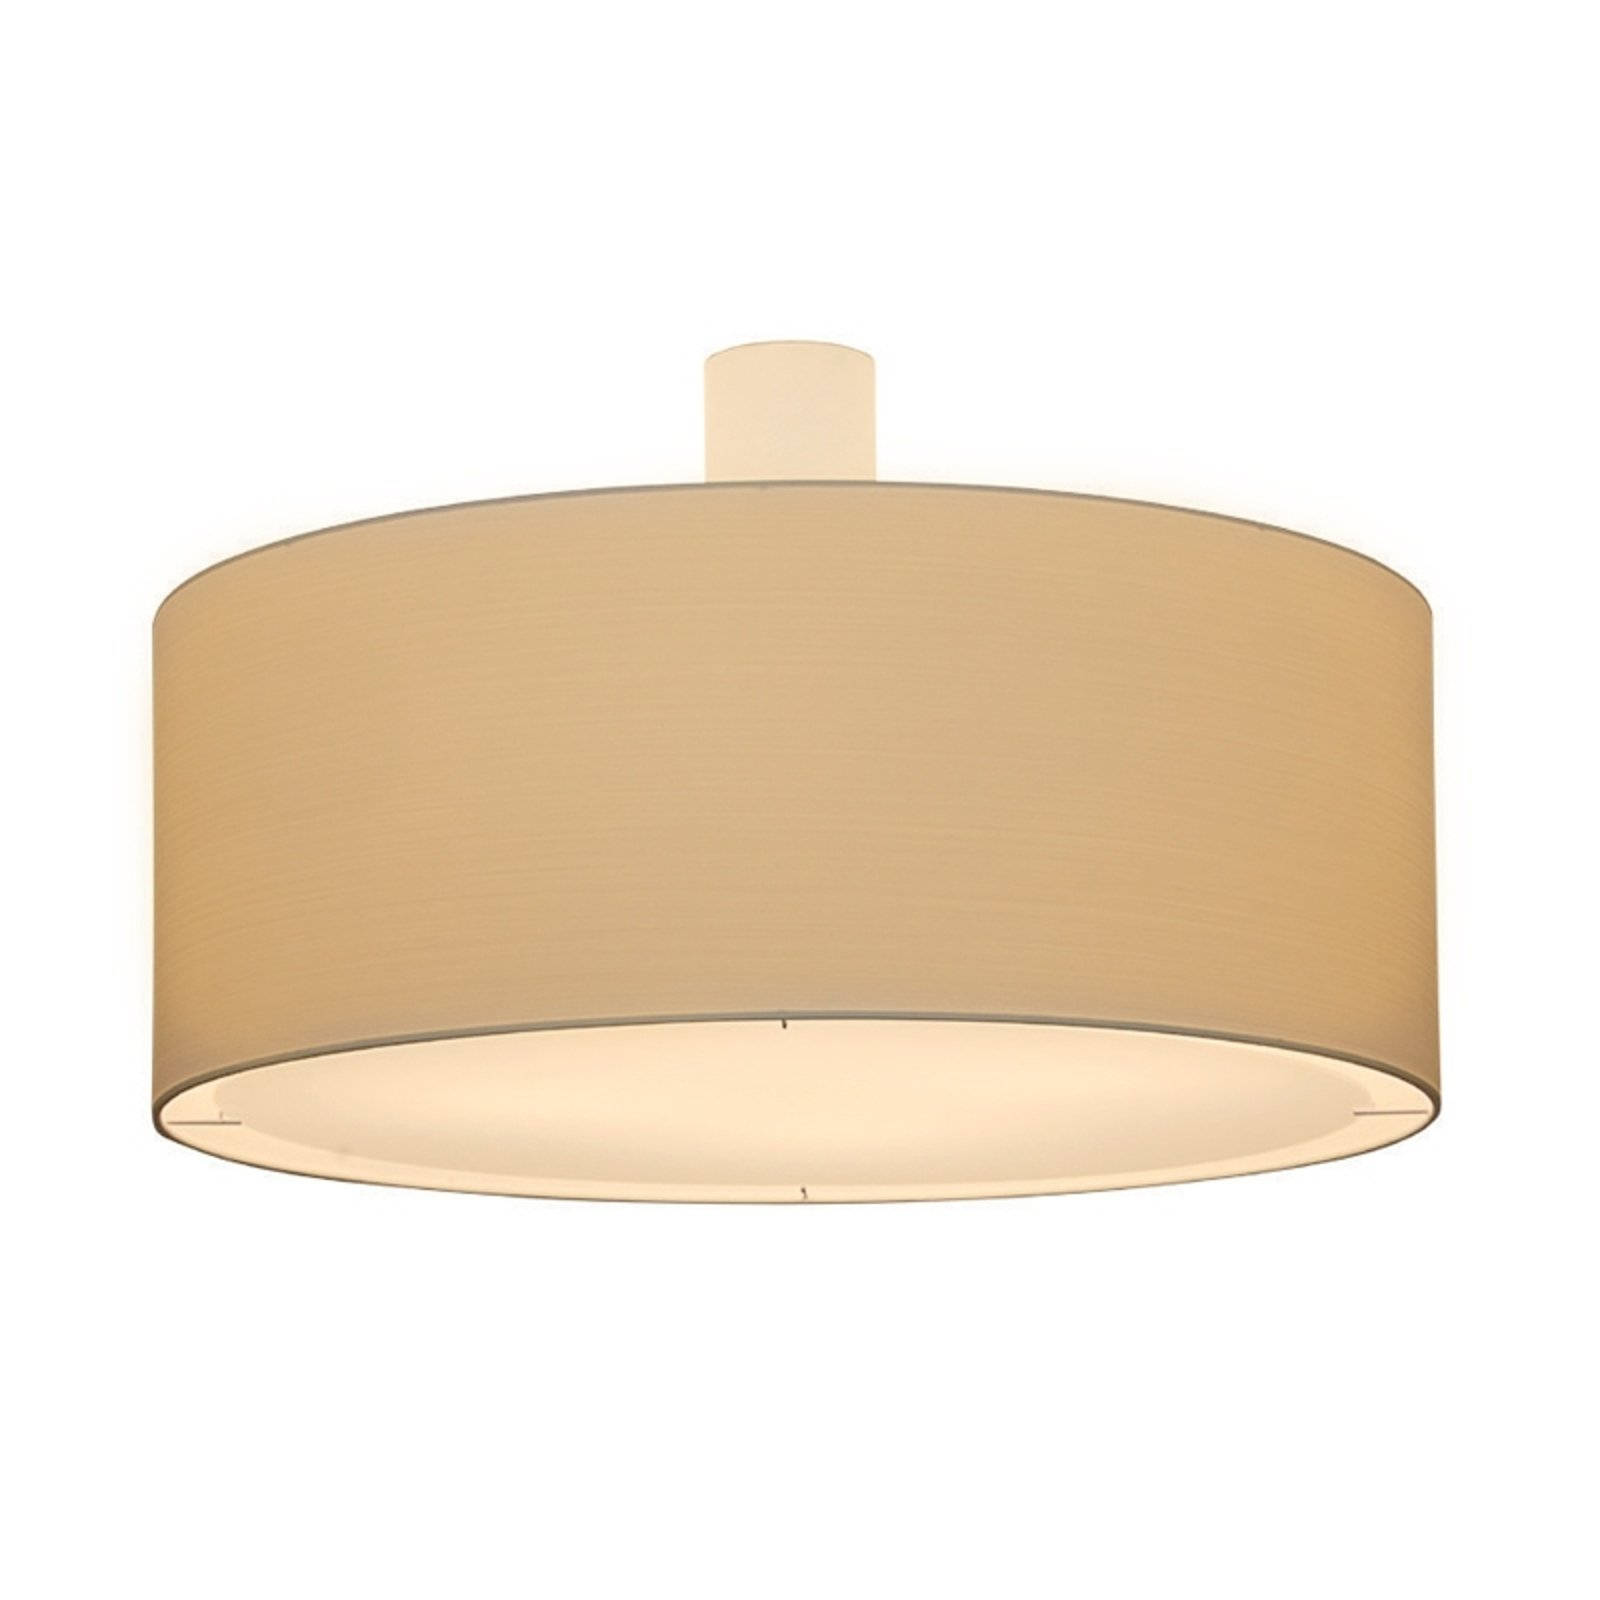 Kremfarget taklampe LIVING ELEGANT Ø 80 cm